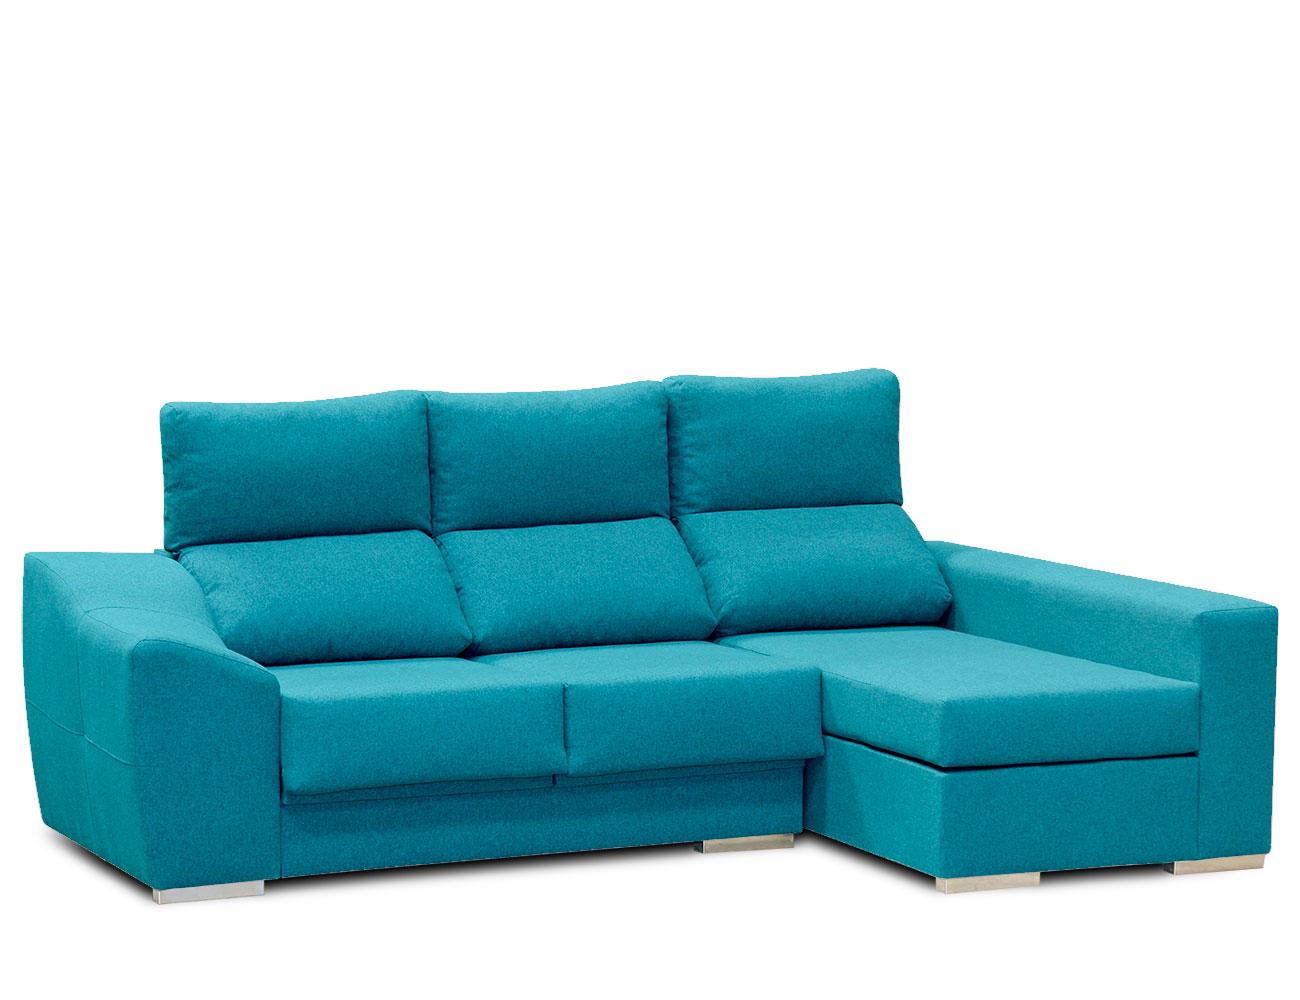 Sofa chaiselongue moderno turquesa 1